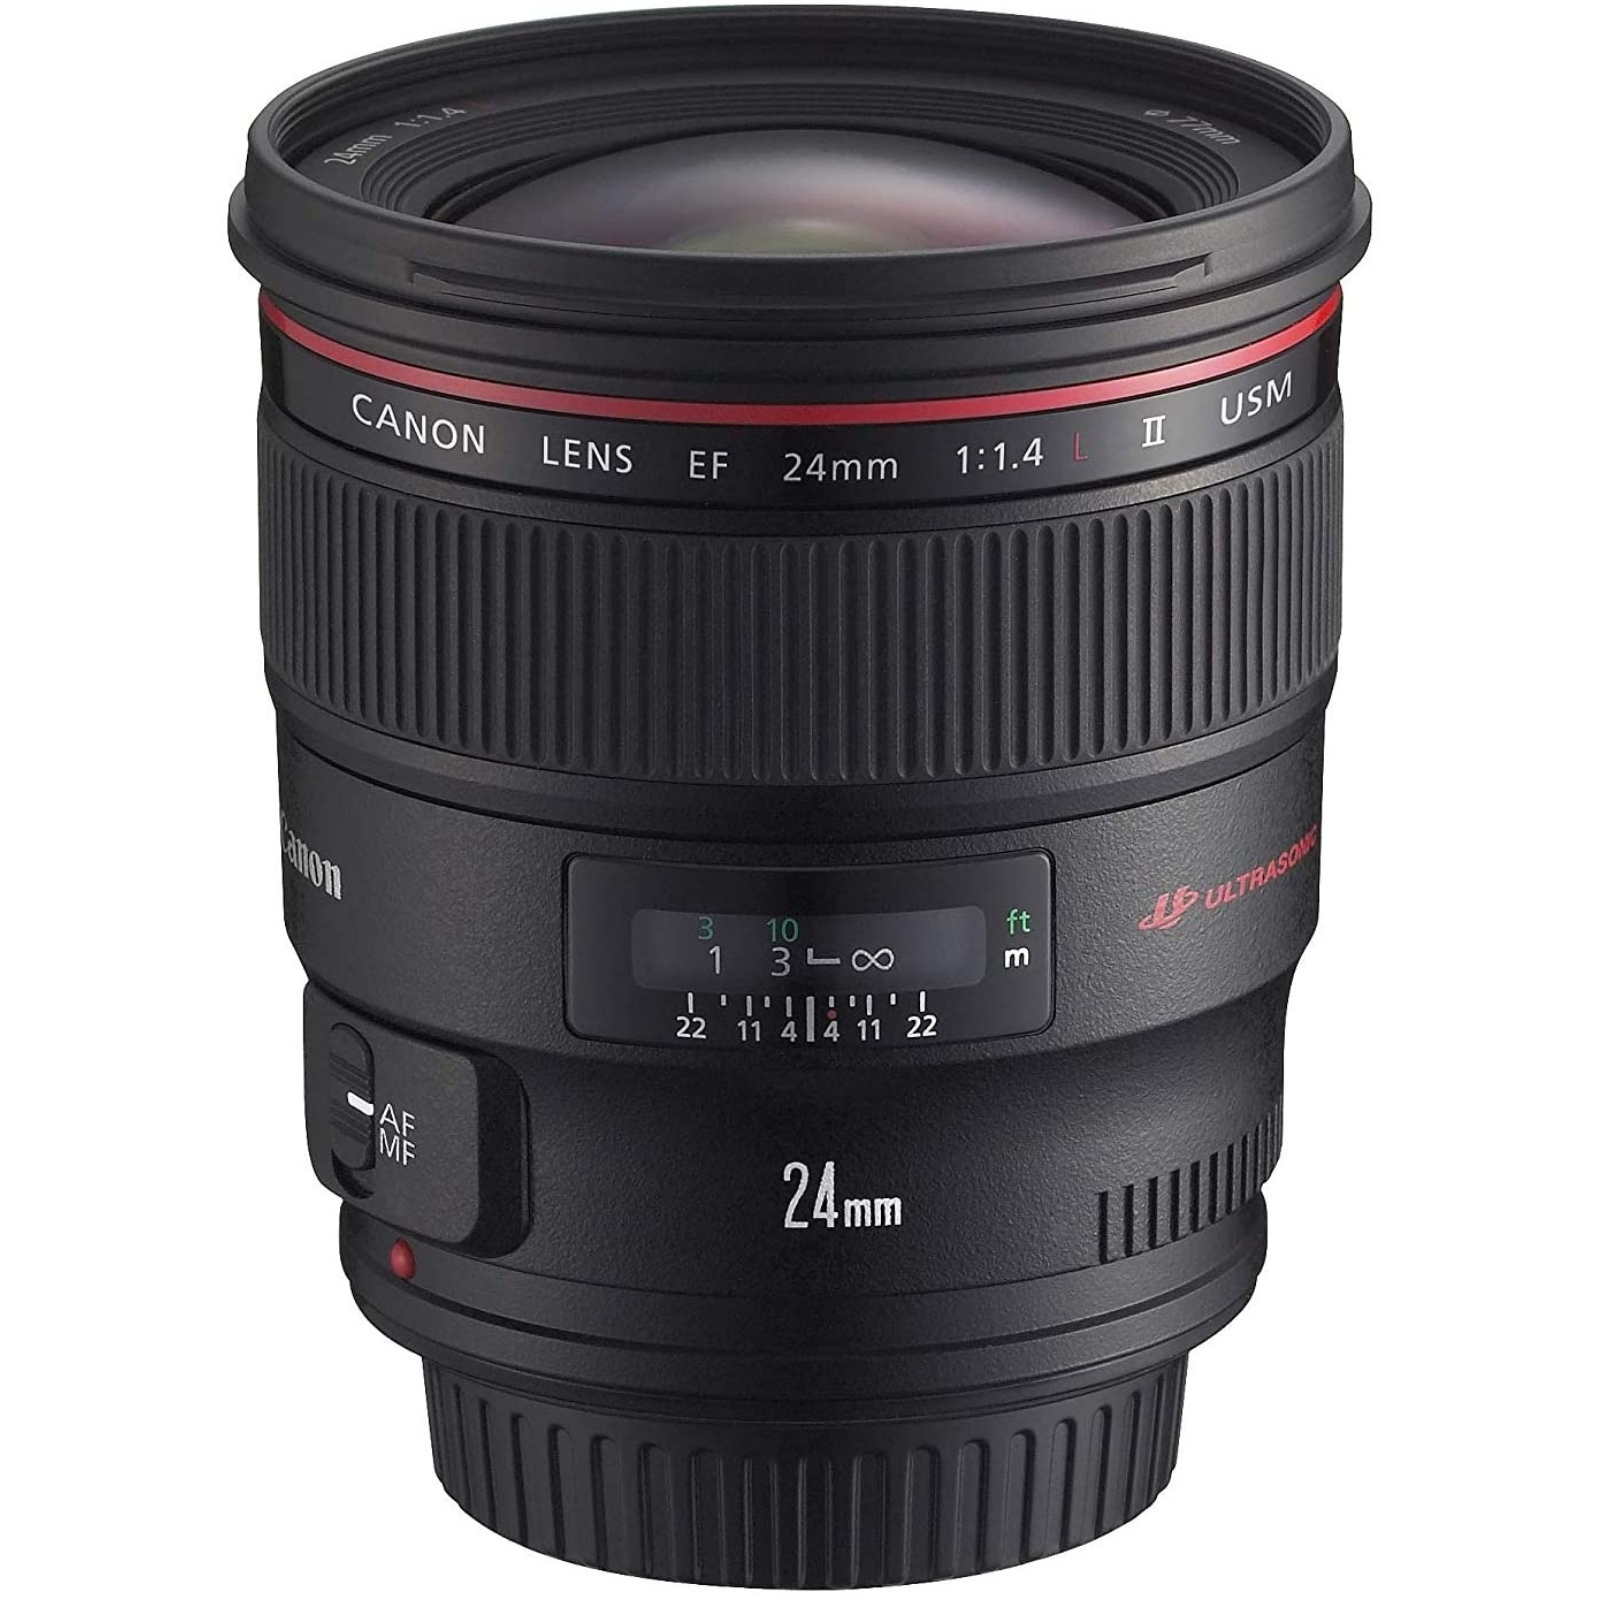 Canon キヤノン 単焦点広角レンズ EF24mm F1.4L II USM ブラック EF2414L2 新品 (並行輸入品、保証付き)